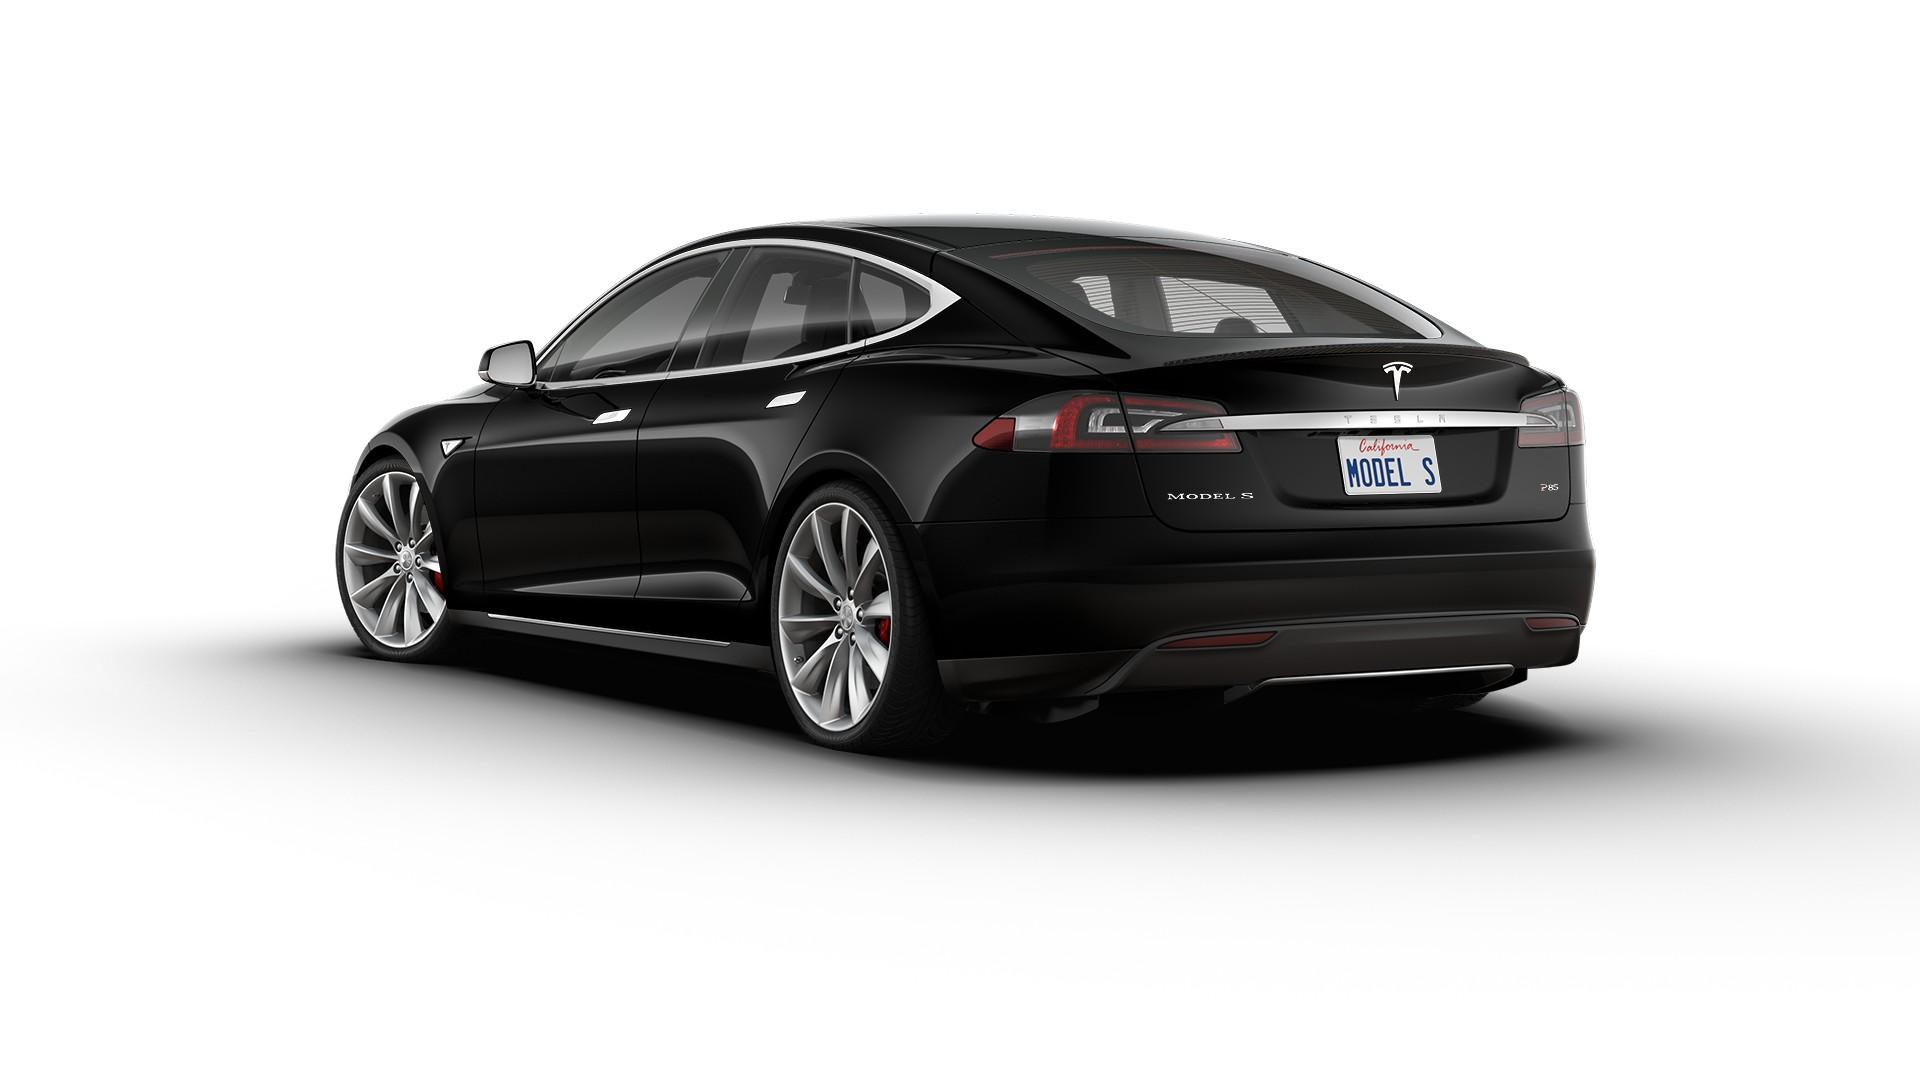 "Exterieur 21"" Silver Turbine Wheels Carbon Fiber Spoiler Solid Black Panoramic Crystal Roof"